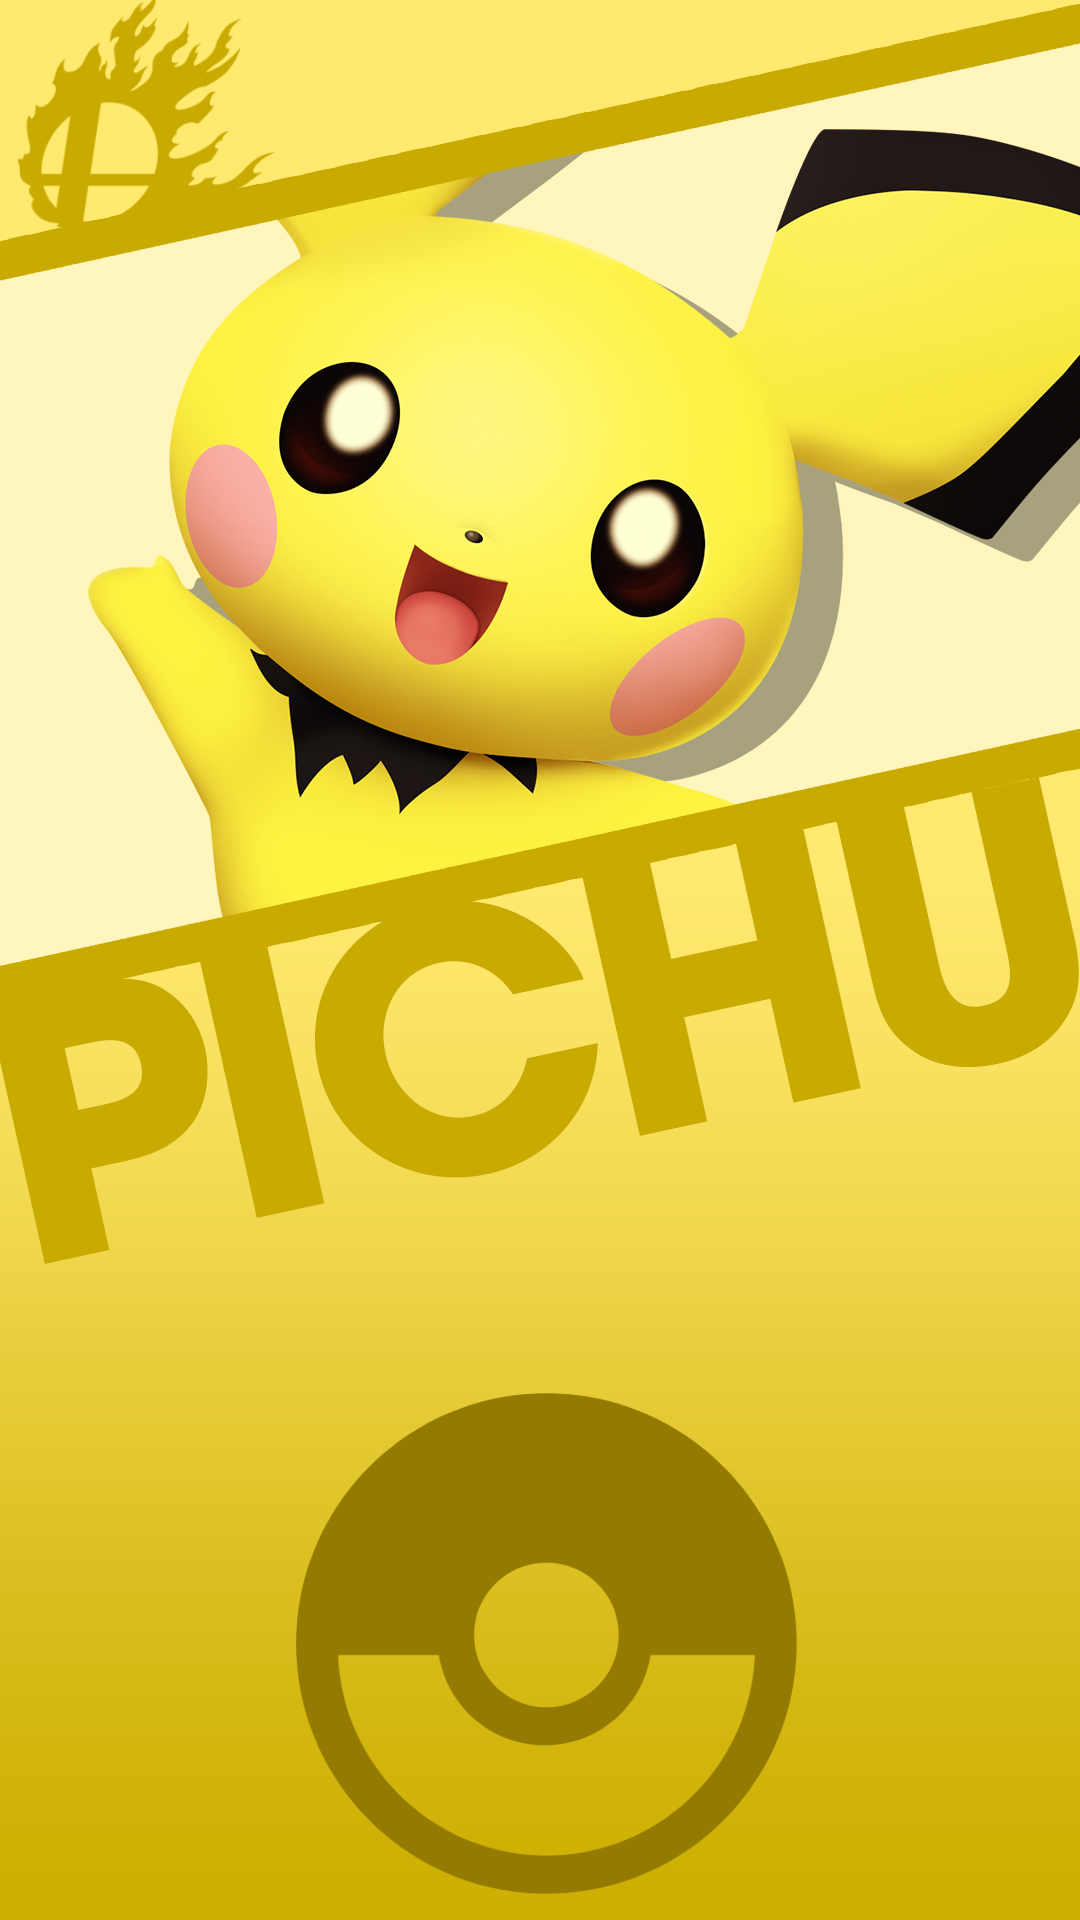 Pichu Smash Phone Wallpaper by MrThatKidAlex24 1080x1920